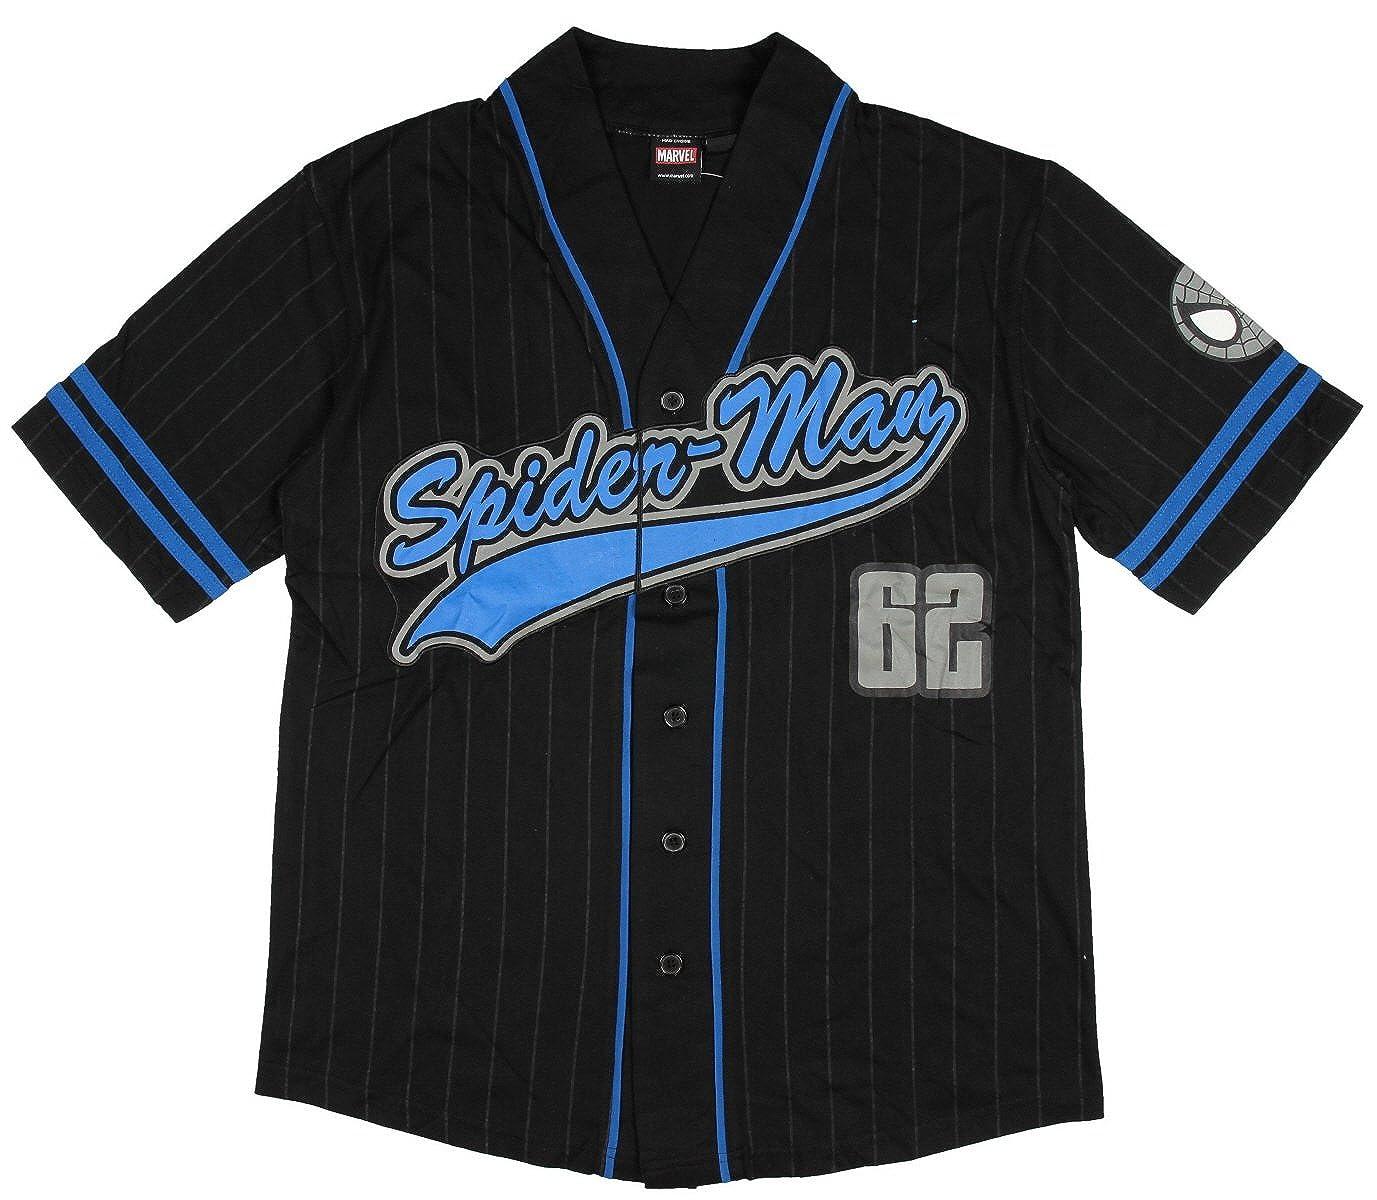 04bc5129393cd Amazon.com  Mad Engine Spiderman Baseball Jersey Black  Clothing